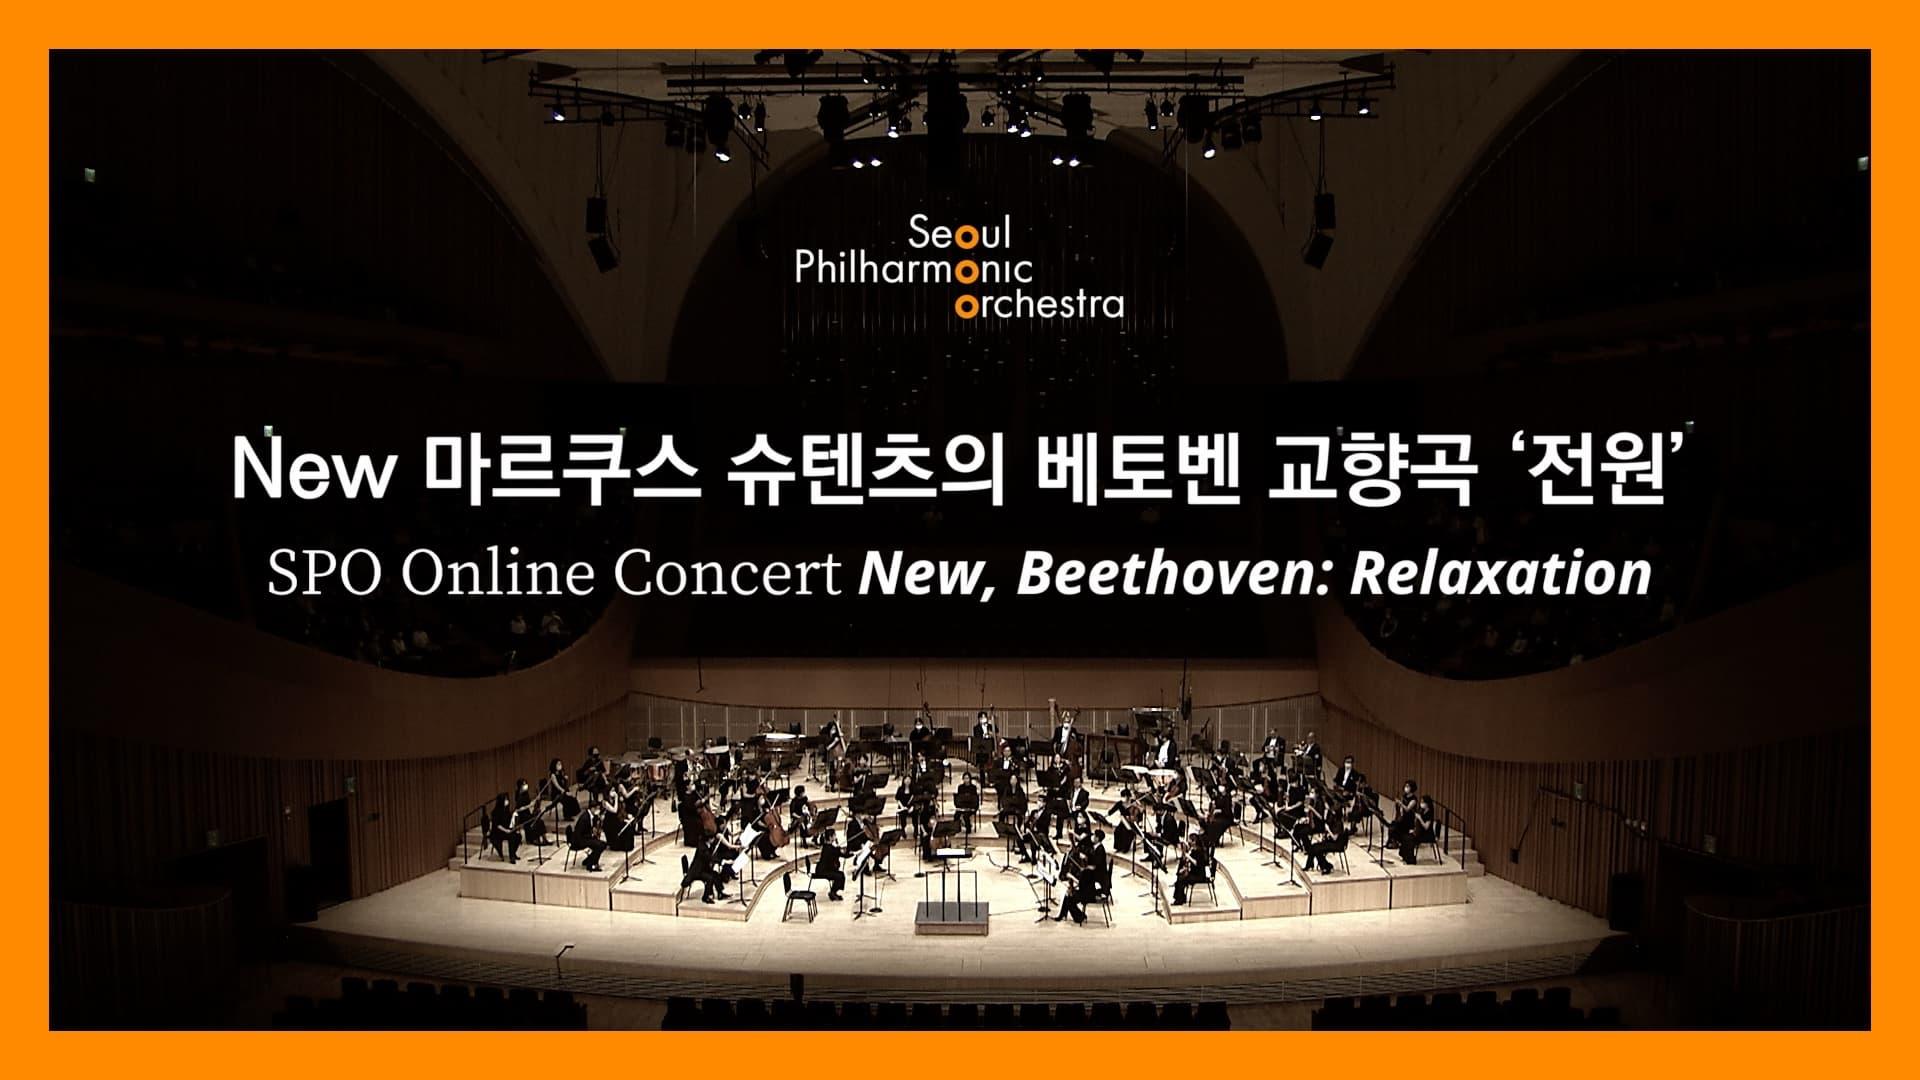 New 마르쿠스 슈텐츠의 베토벤 교향곡 '전원'